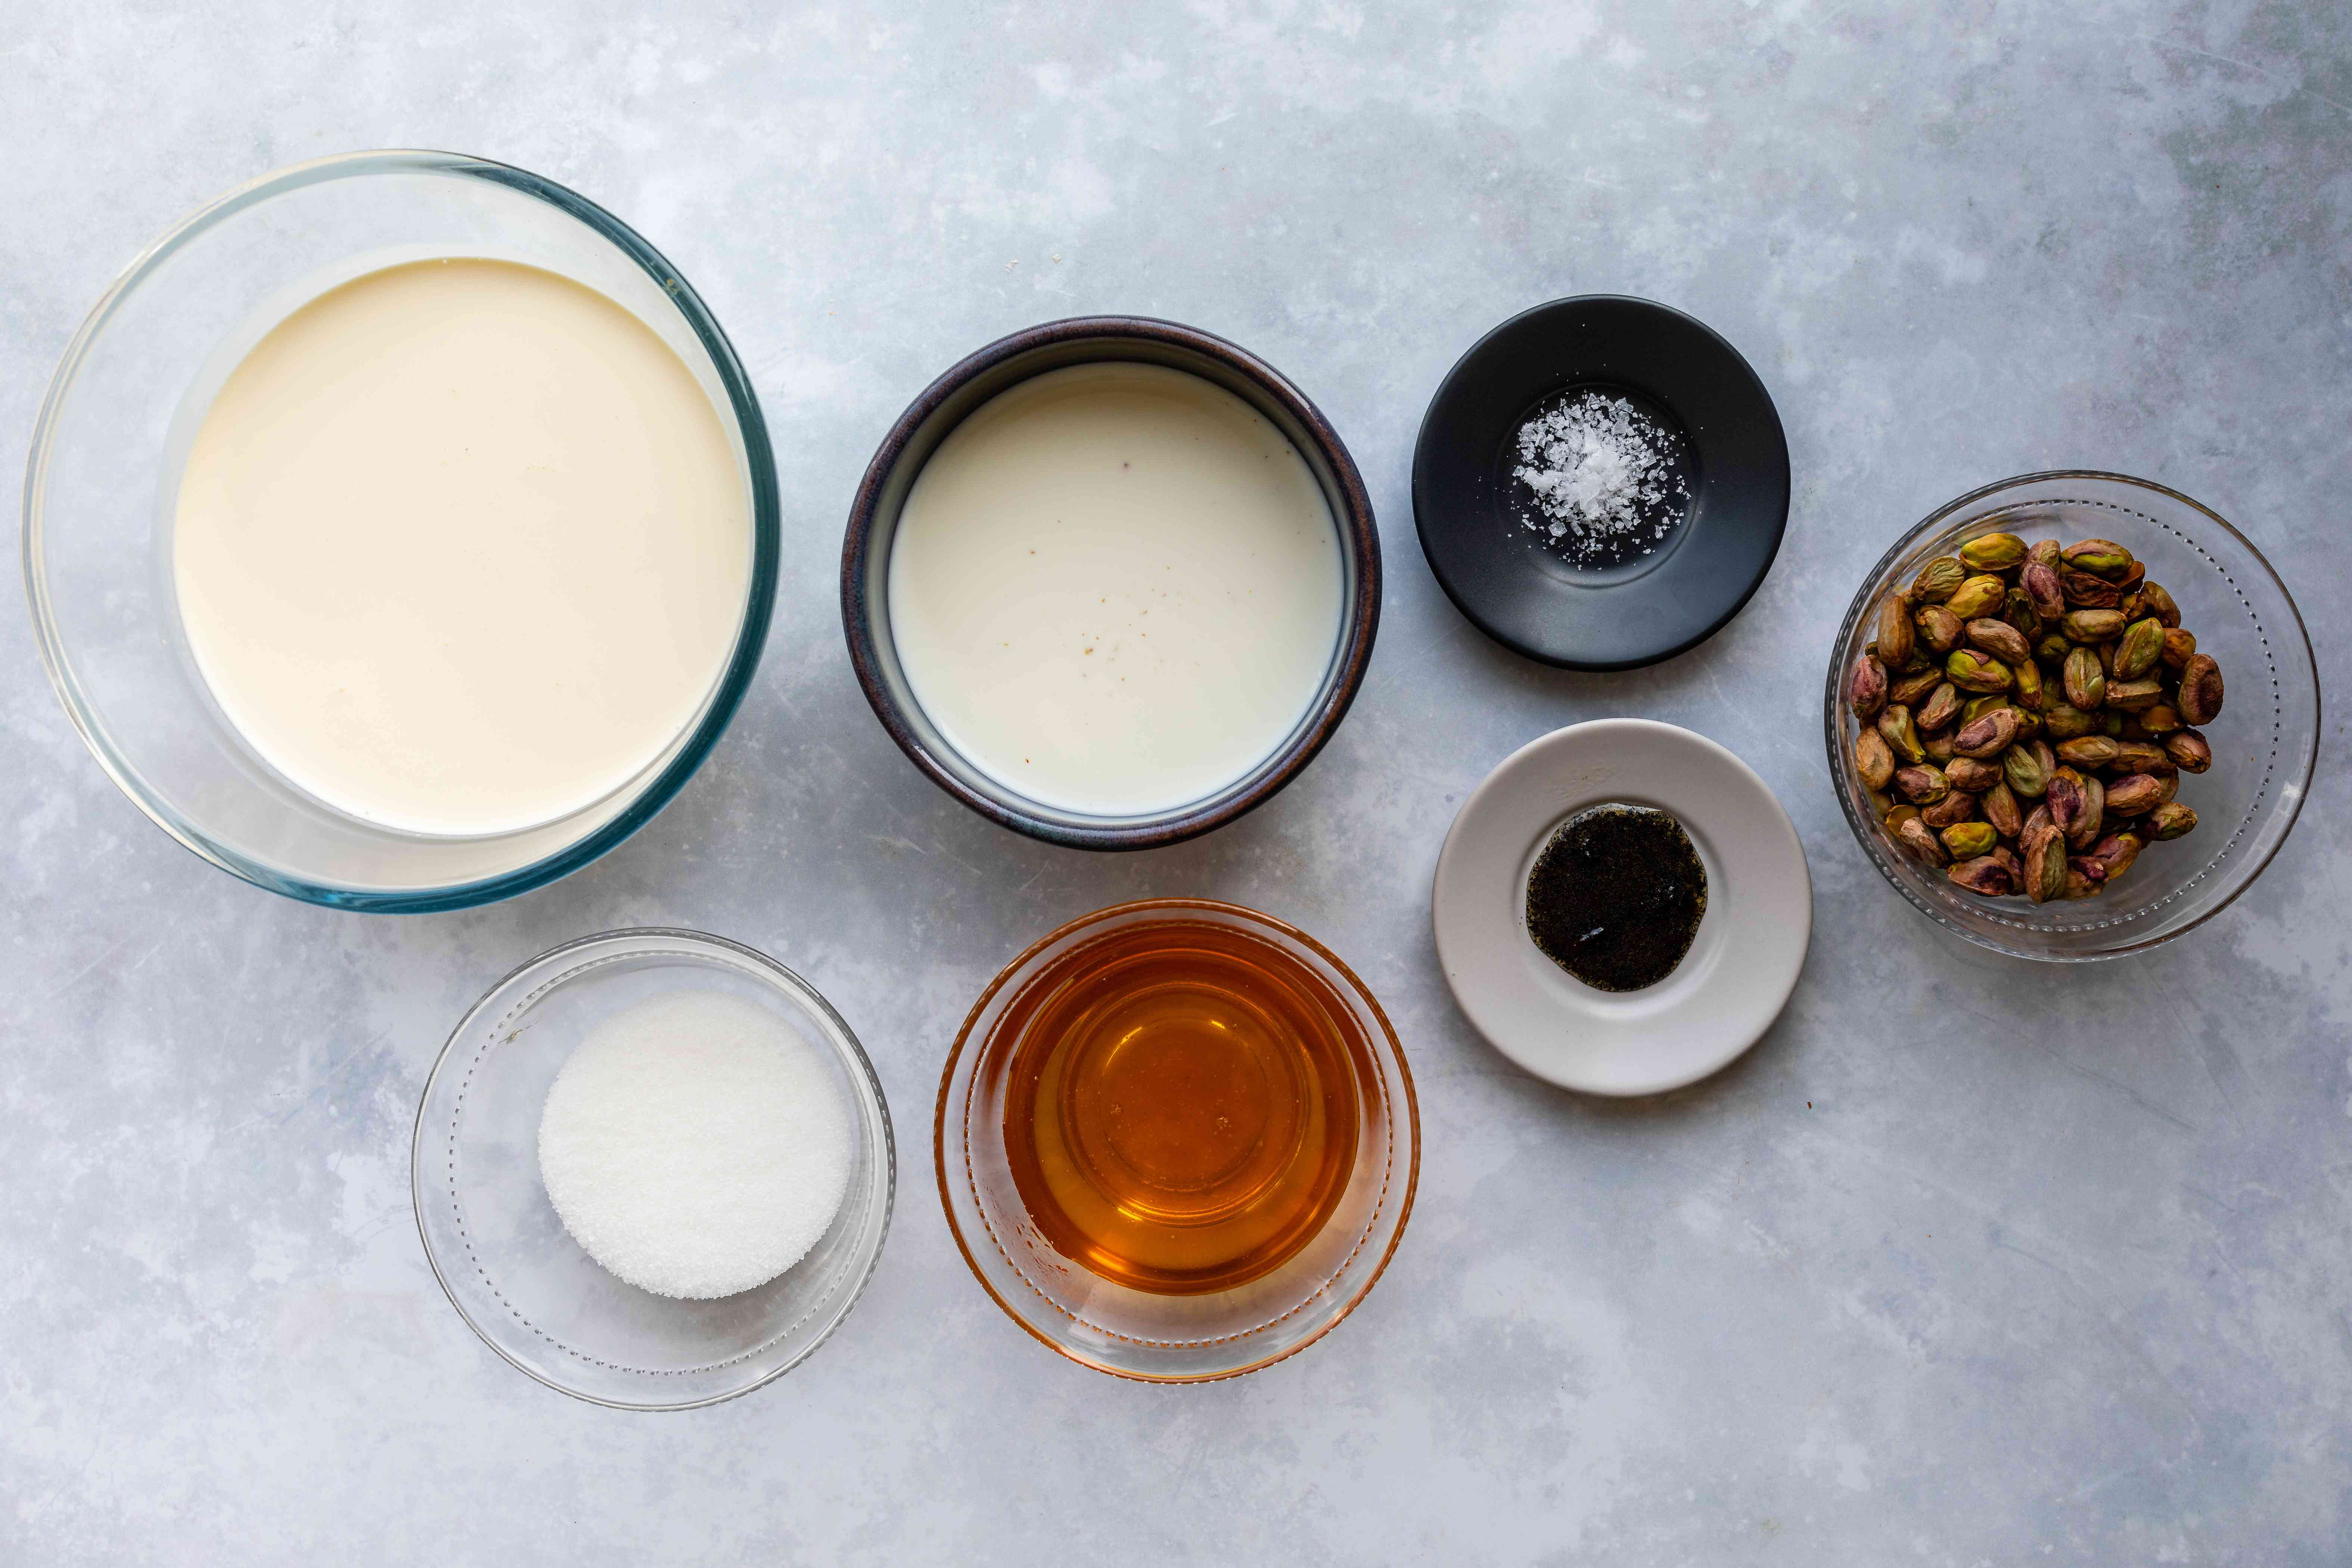 Ingredients for honey pistachio